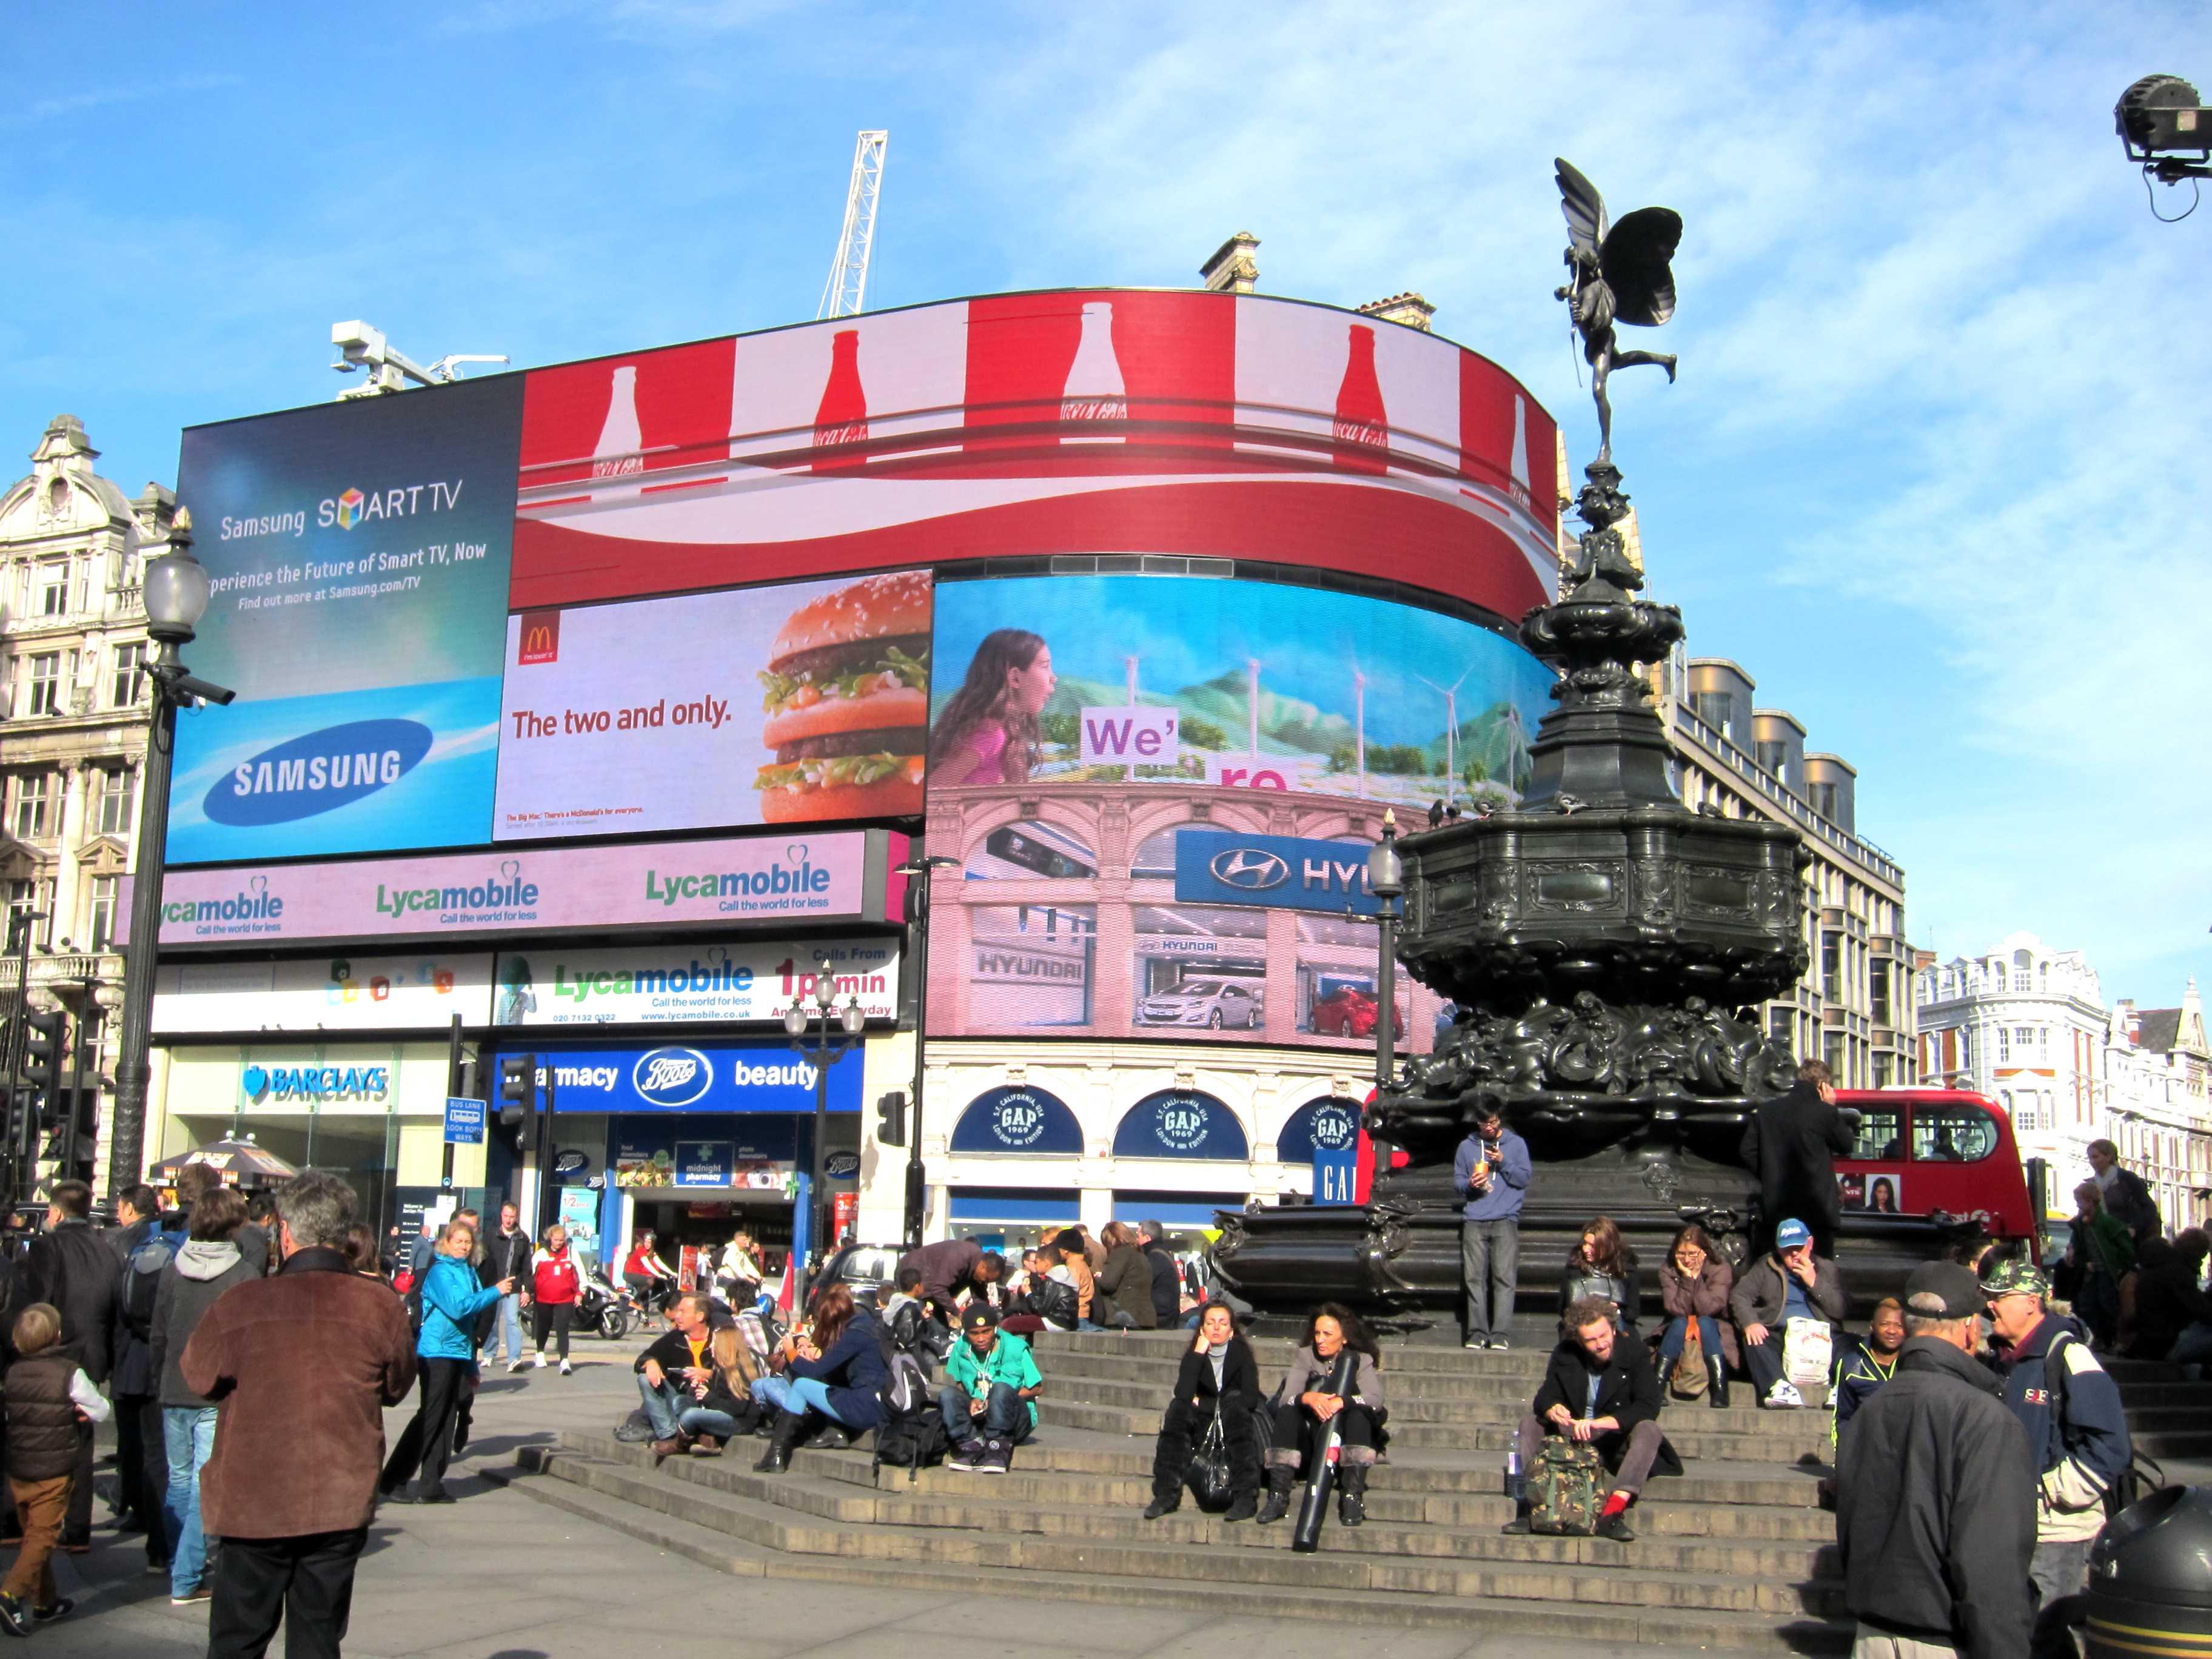 Piccadilly Circus Itcc Emergency Locksmiths